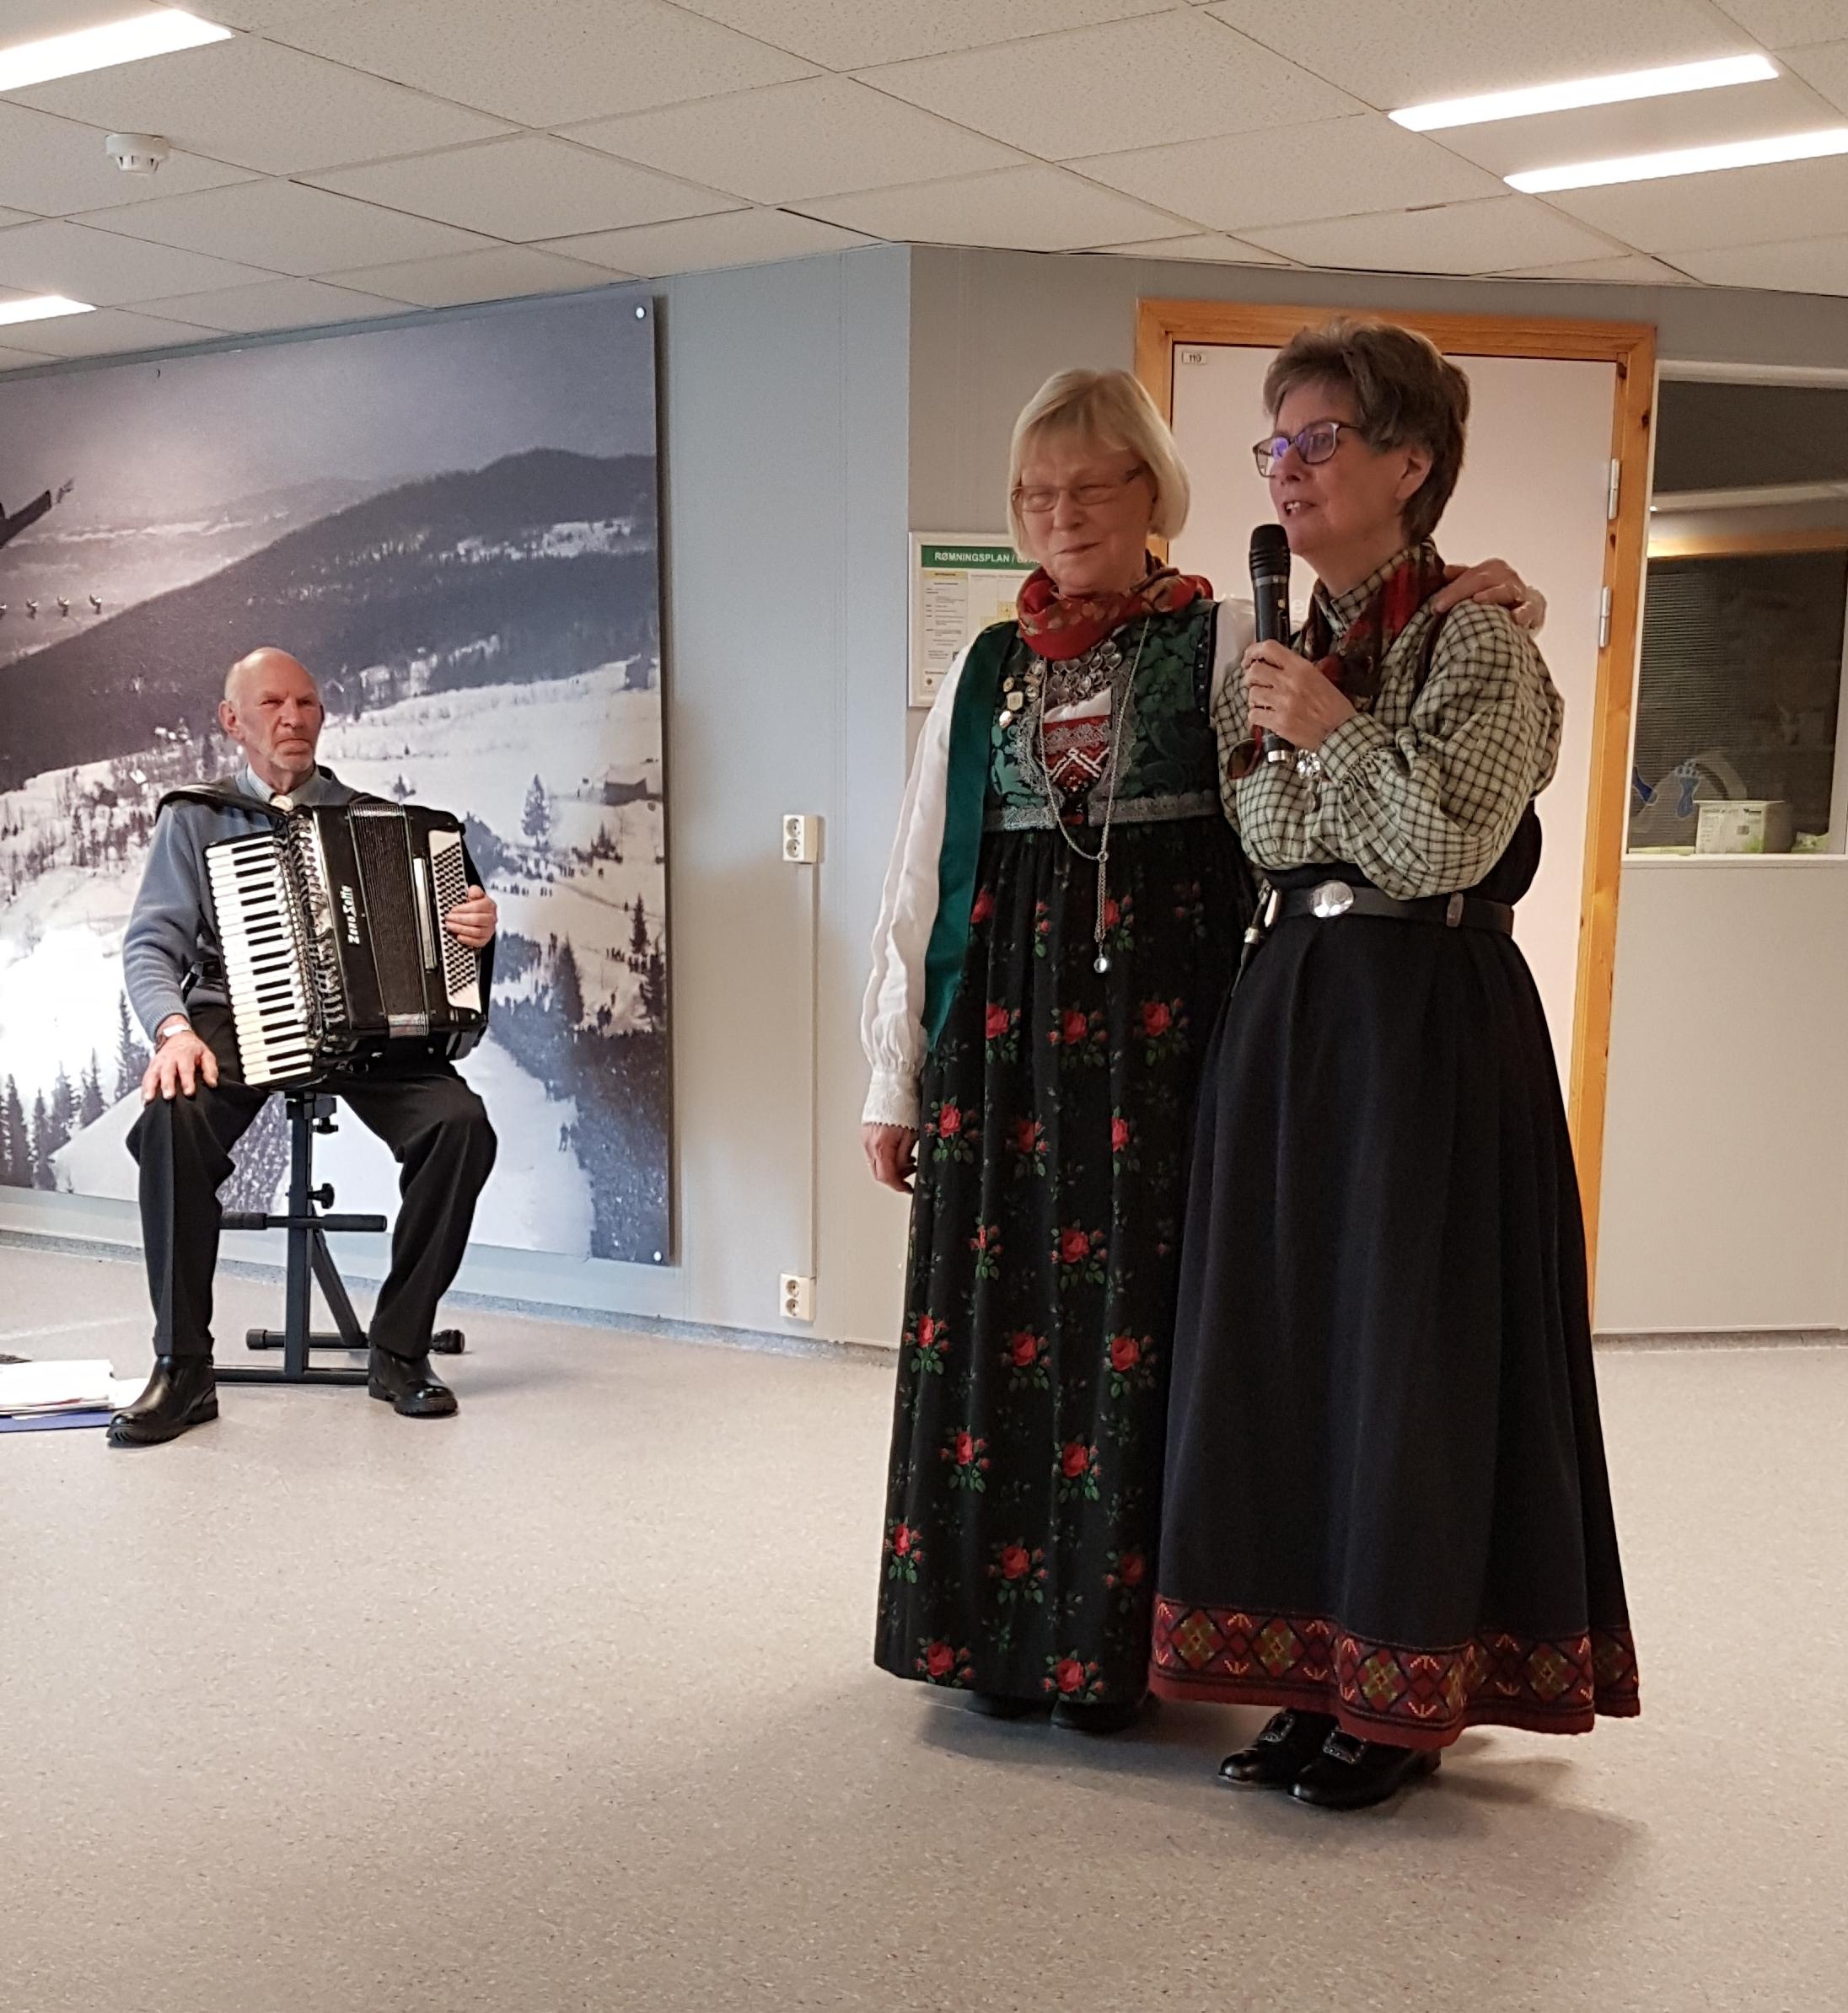 Leikarringen_Noreg_Fremsyning_20180325_100103.jpg